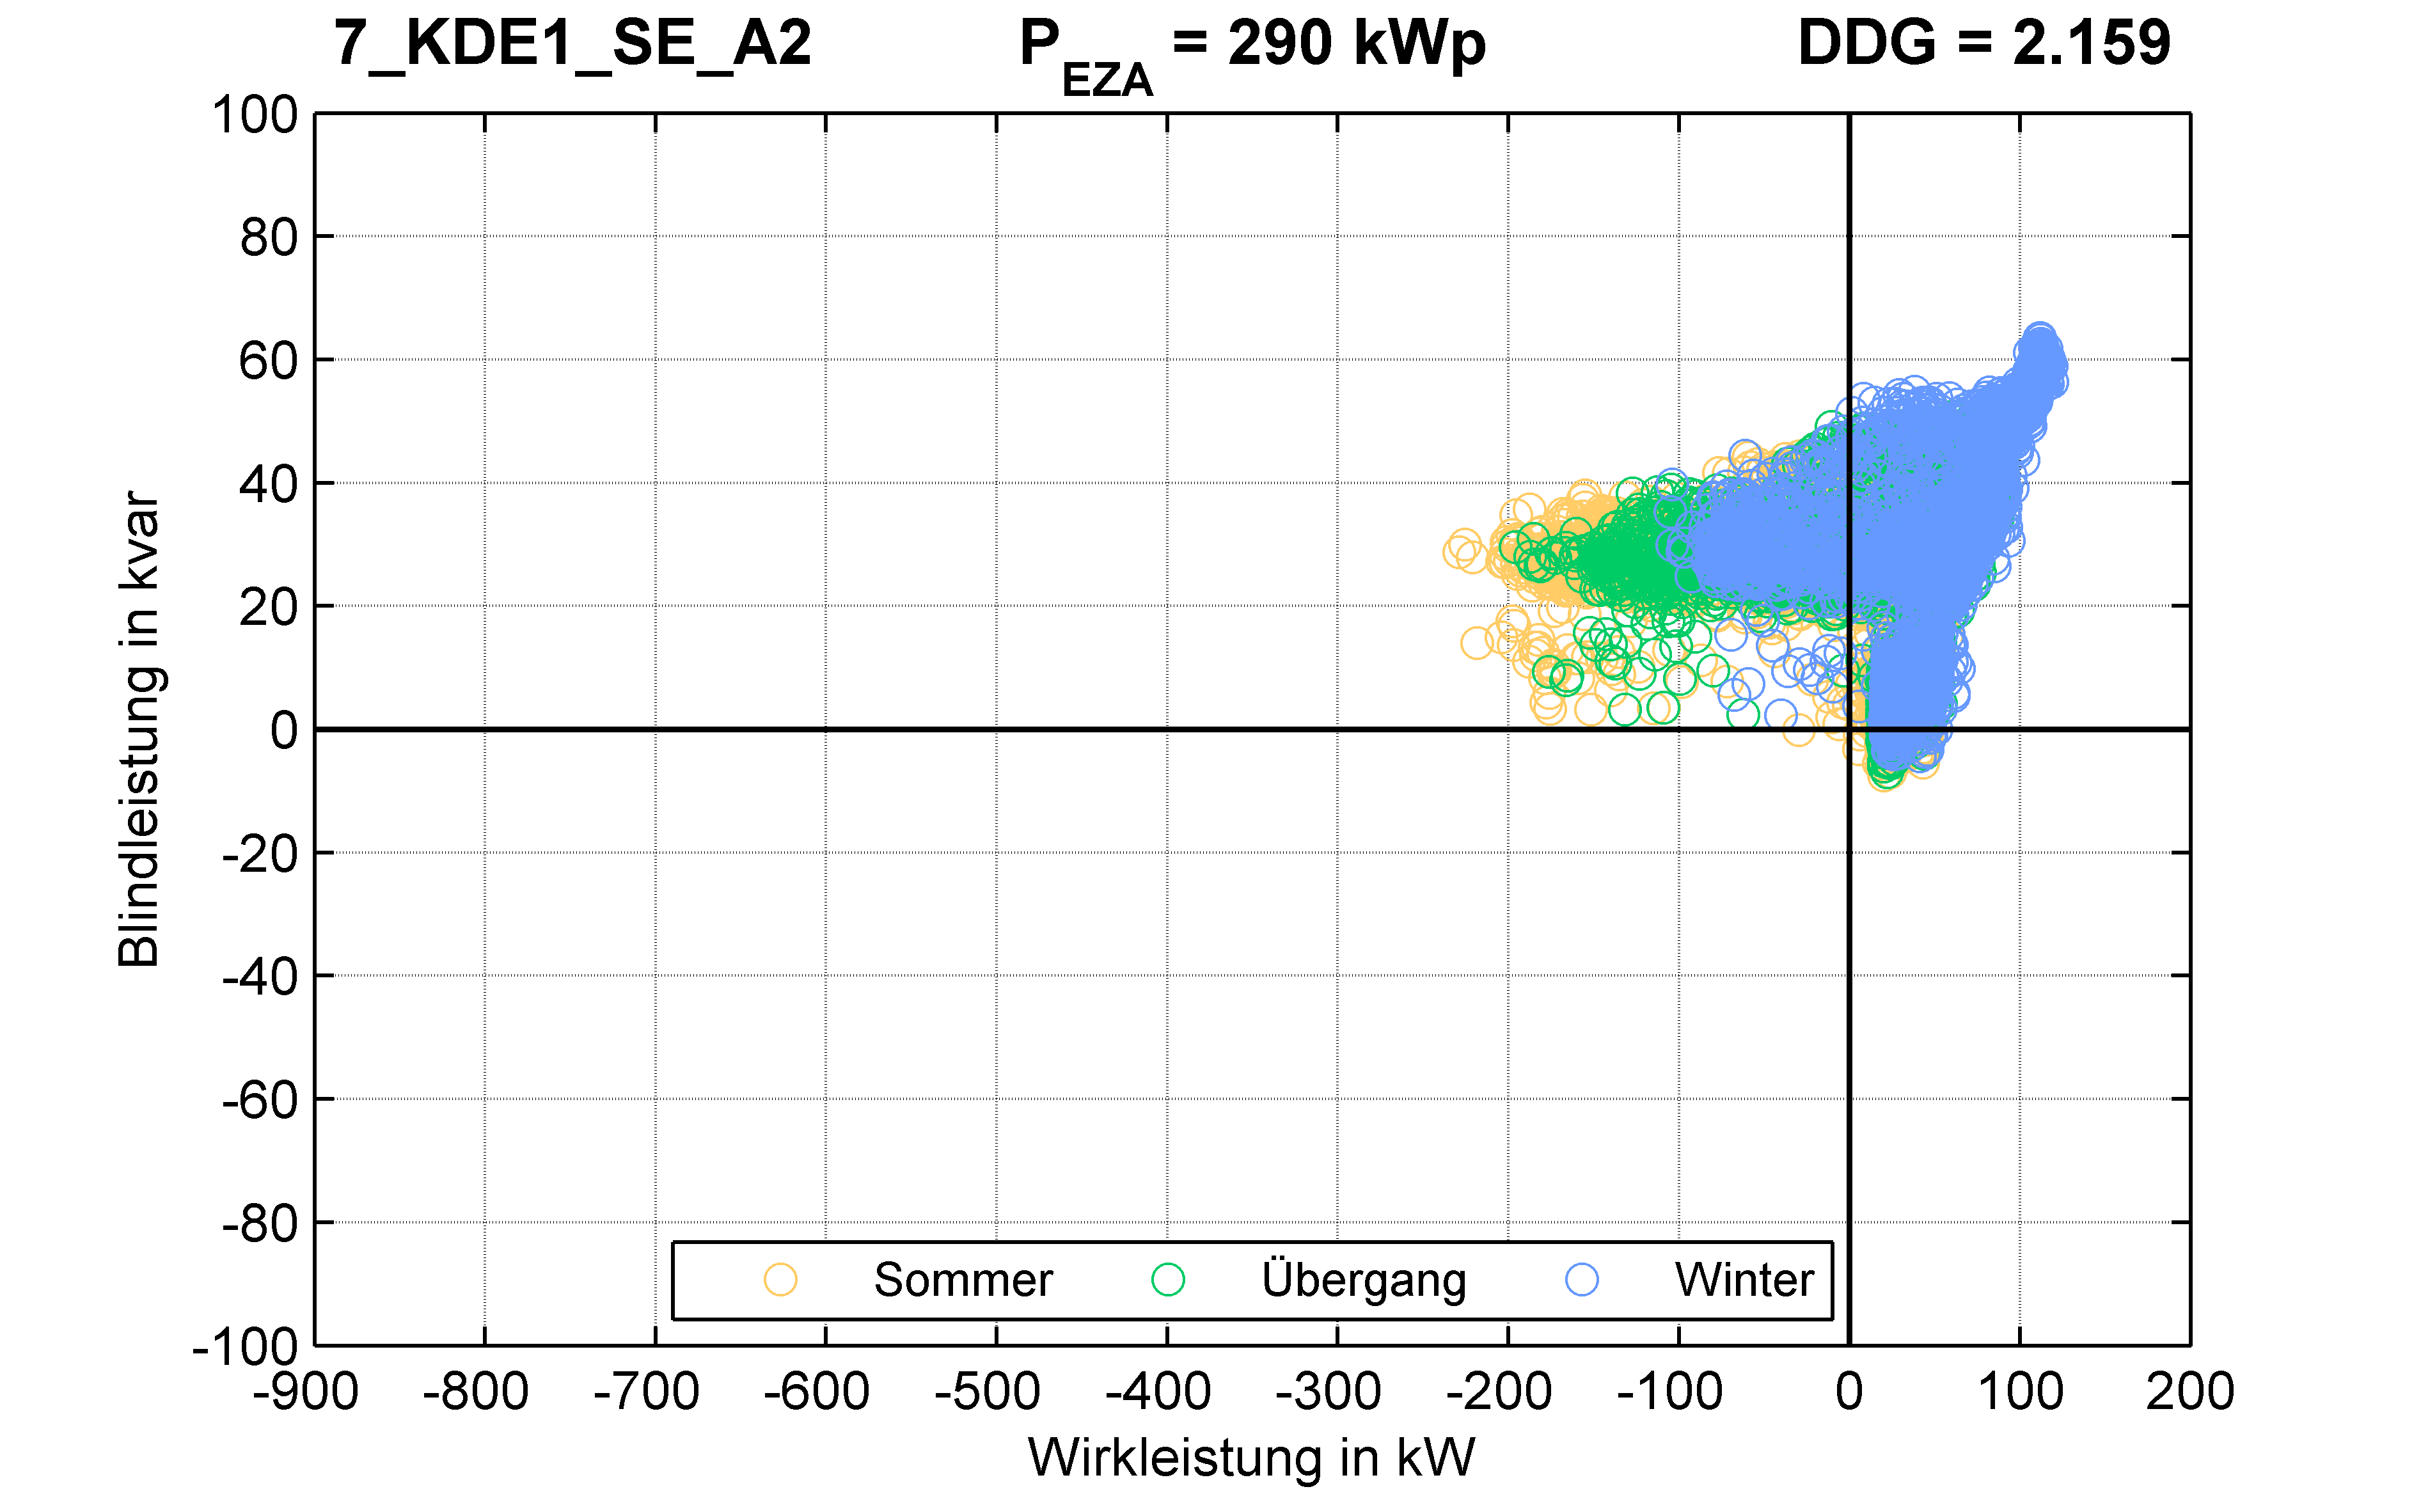 KDE1 | Längsregler (SE) A2 | PQ-Verhalten